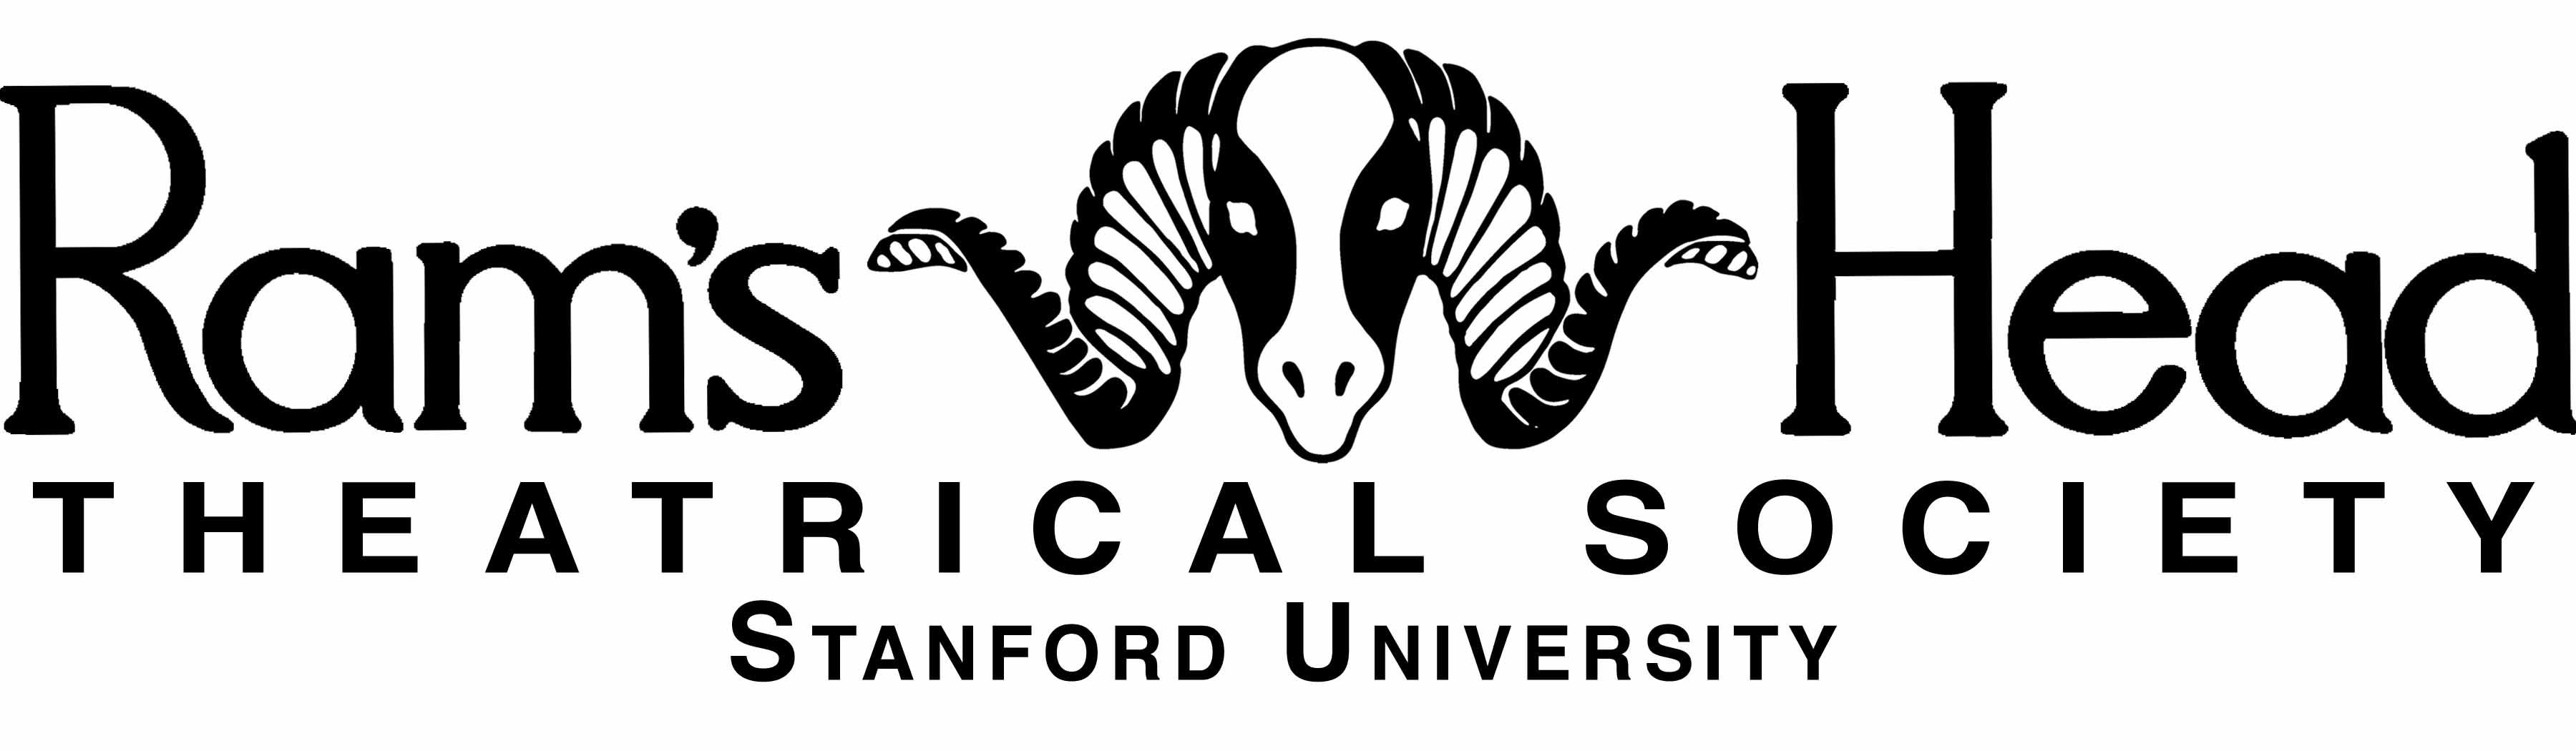 Rams Head Theatrical Society Stanford University Logo